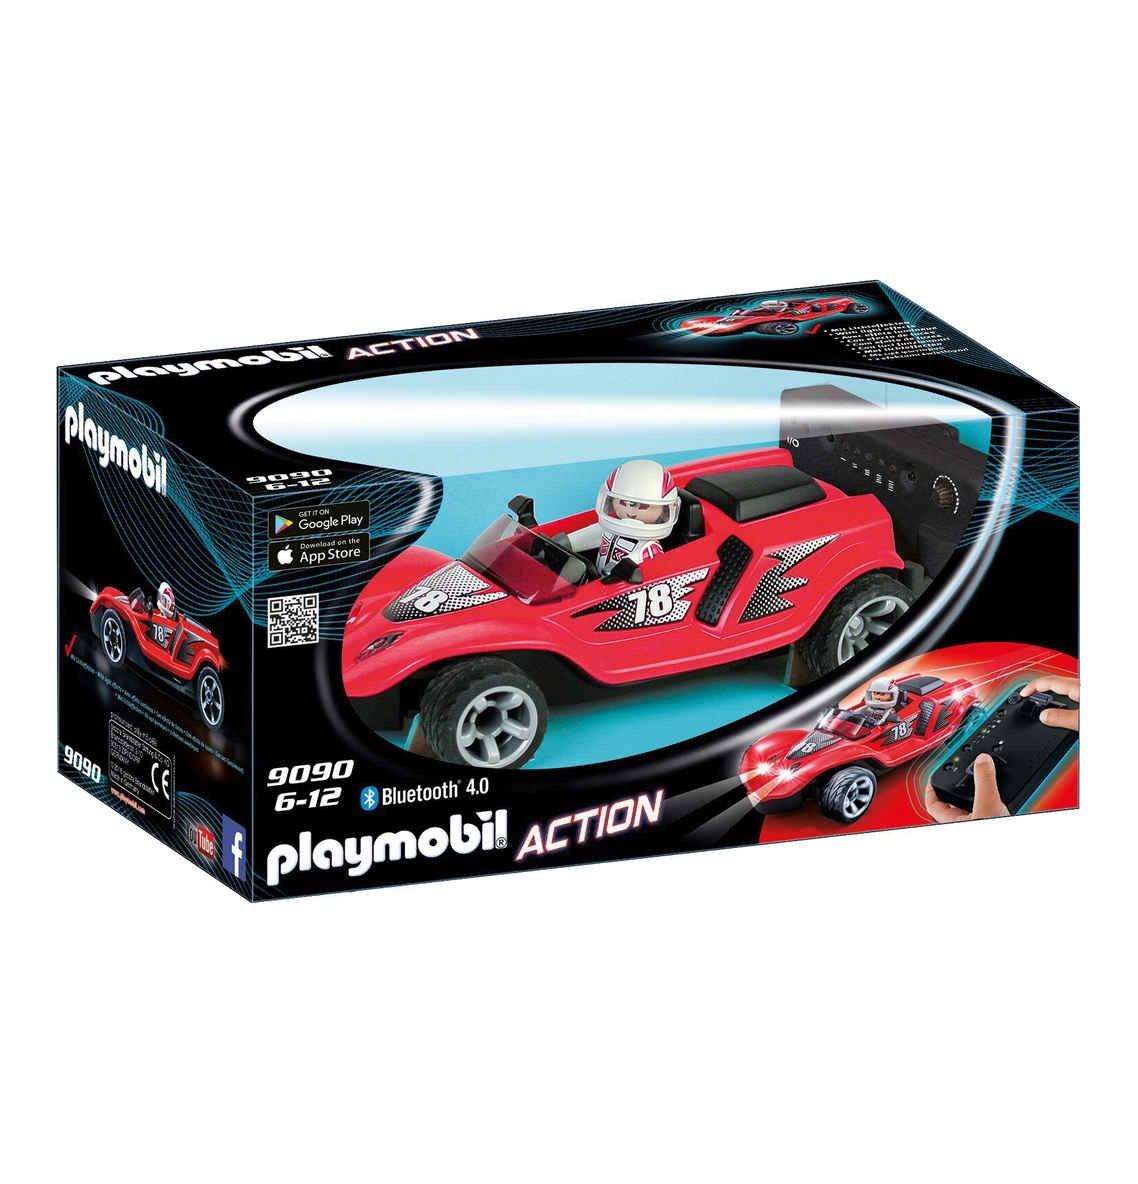 Playmobil Rocket Racer 9090  Ferngesteuertes Rennauto Auto 6-12 Jahre